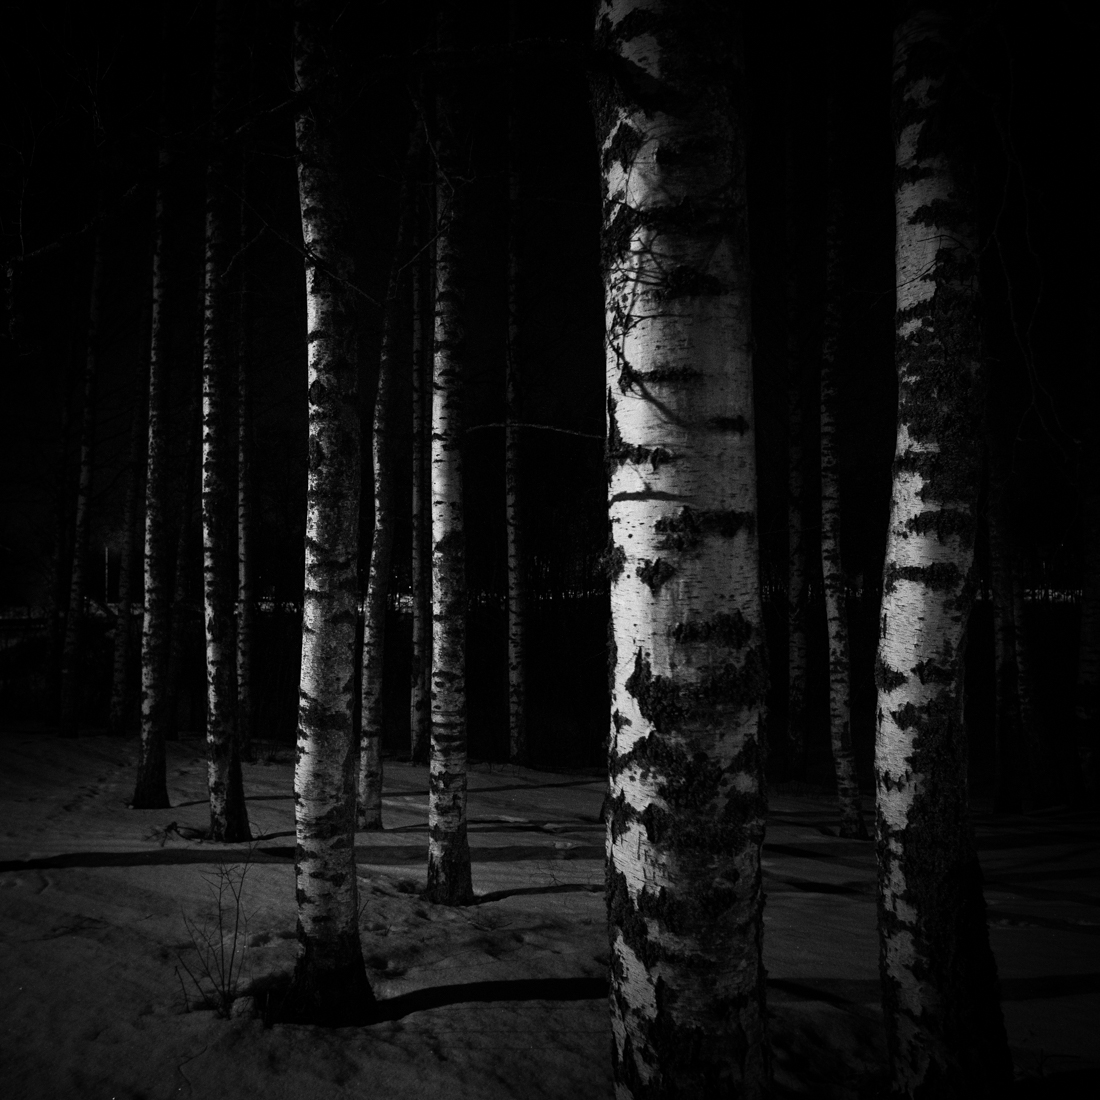 birch_night_TeemuOksanen.jpg